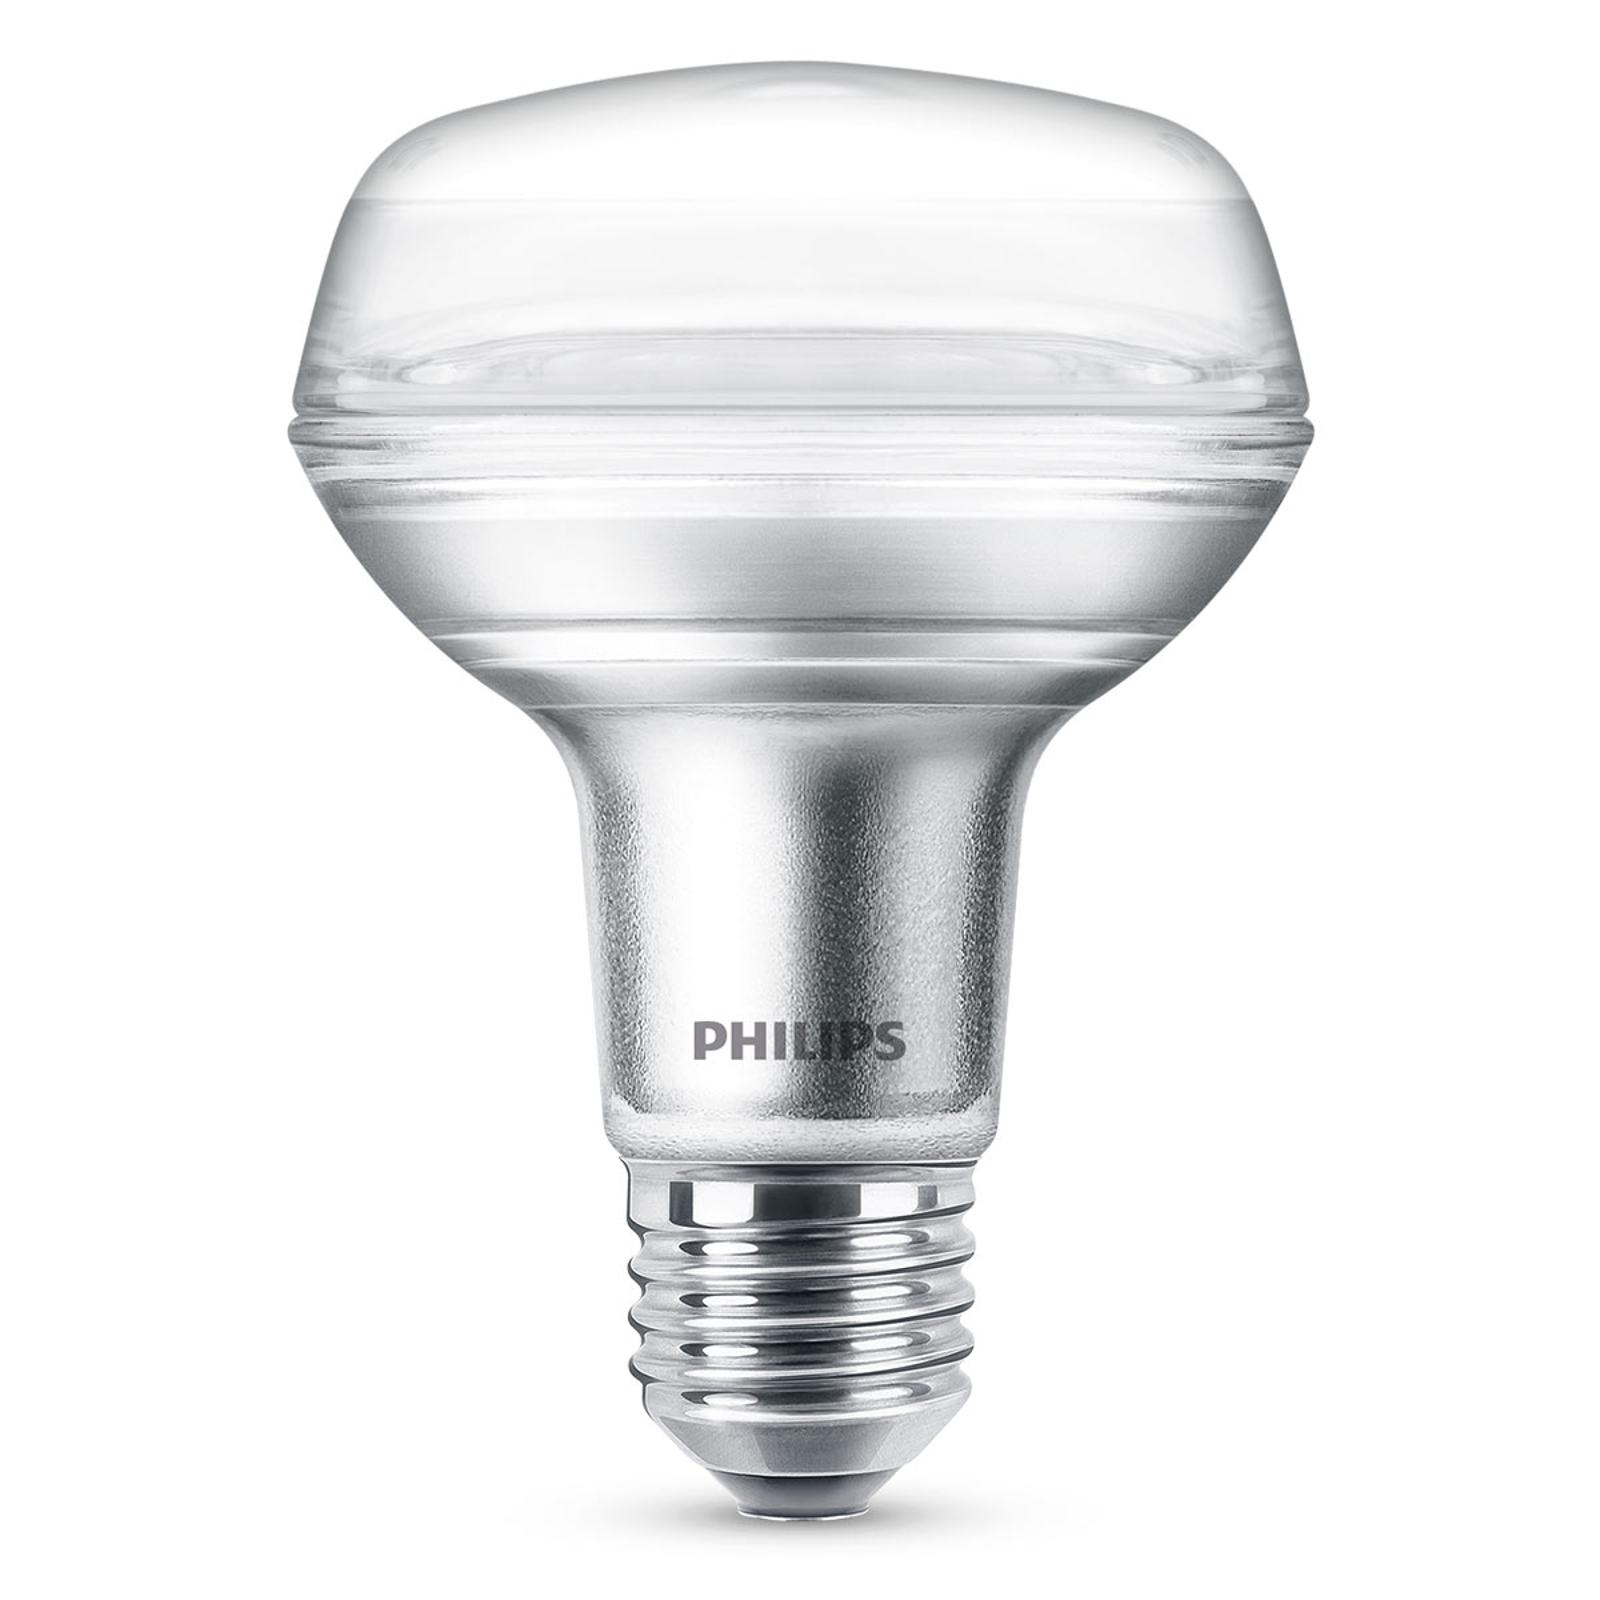 Philips LED-Reflektor E27 R80 4W 827